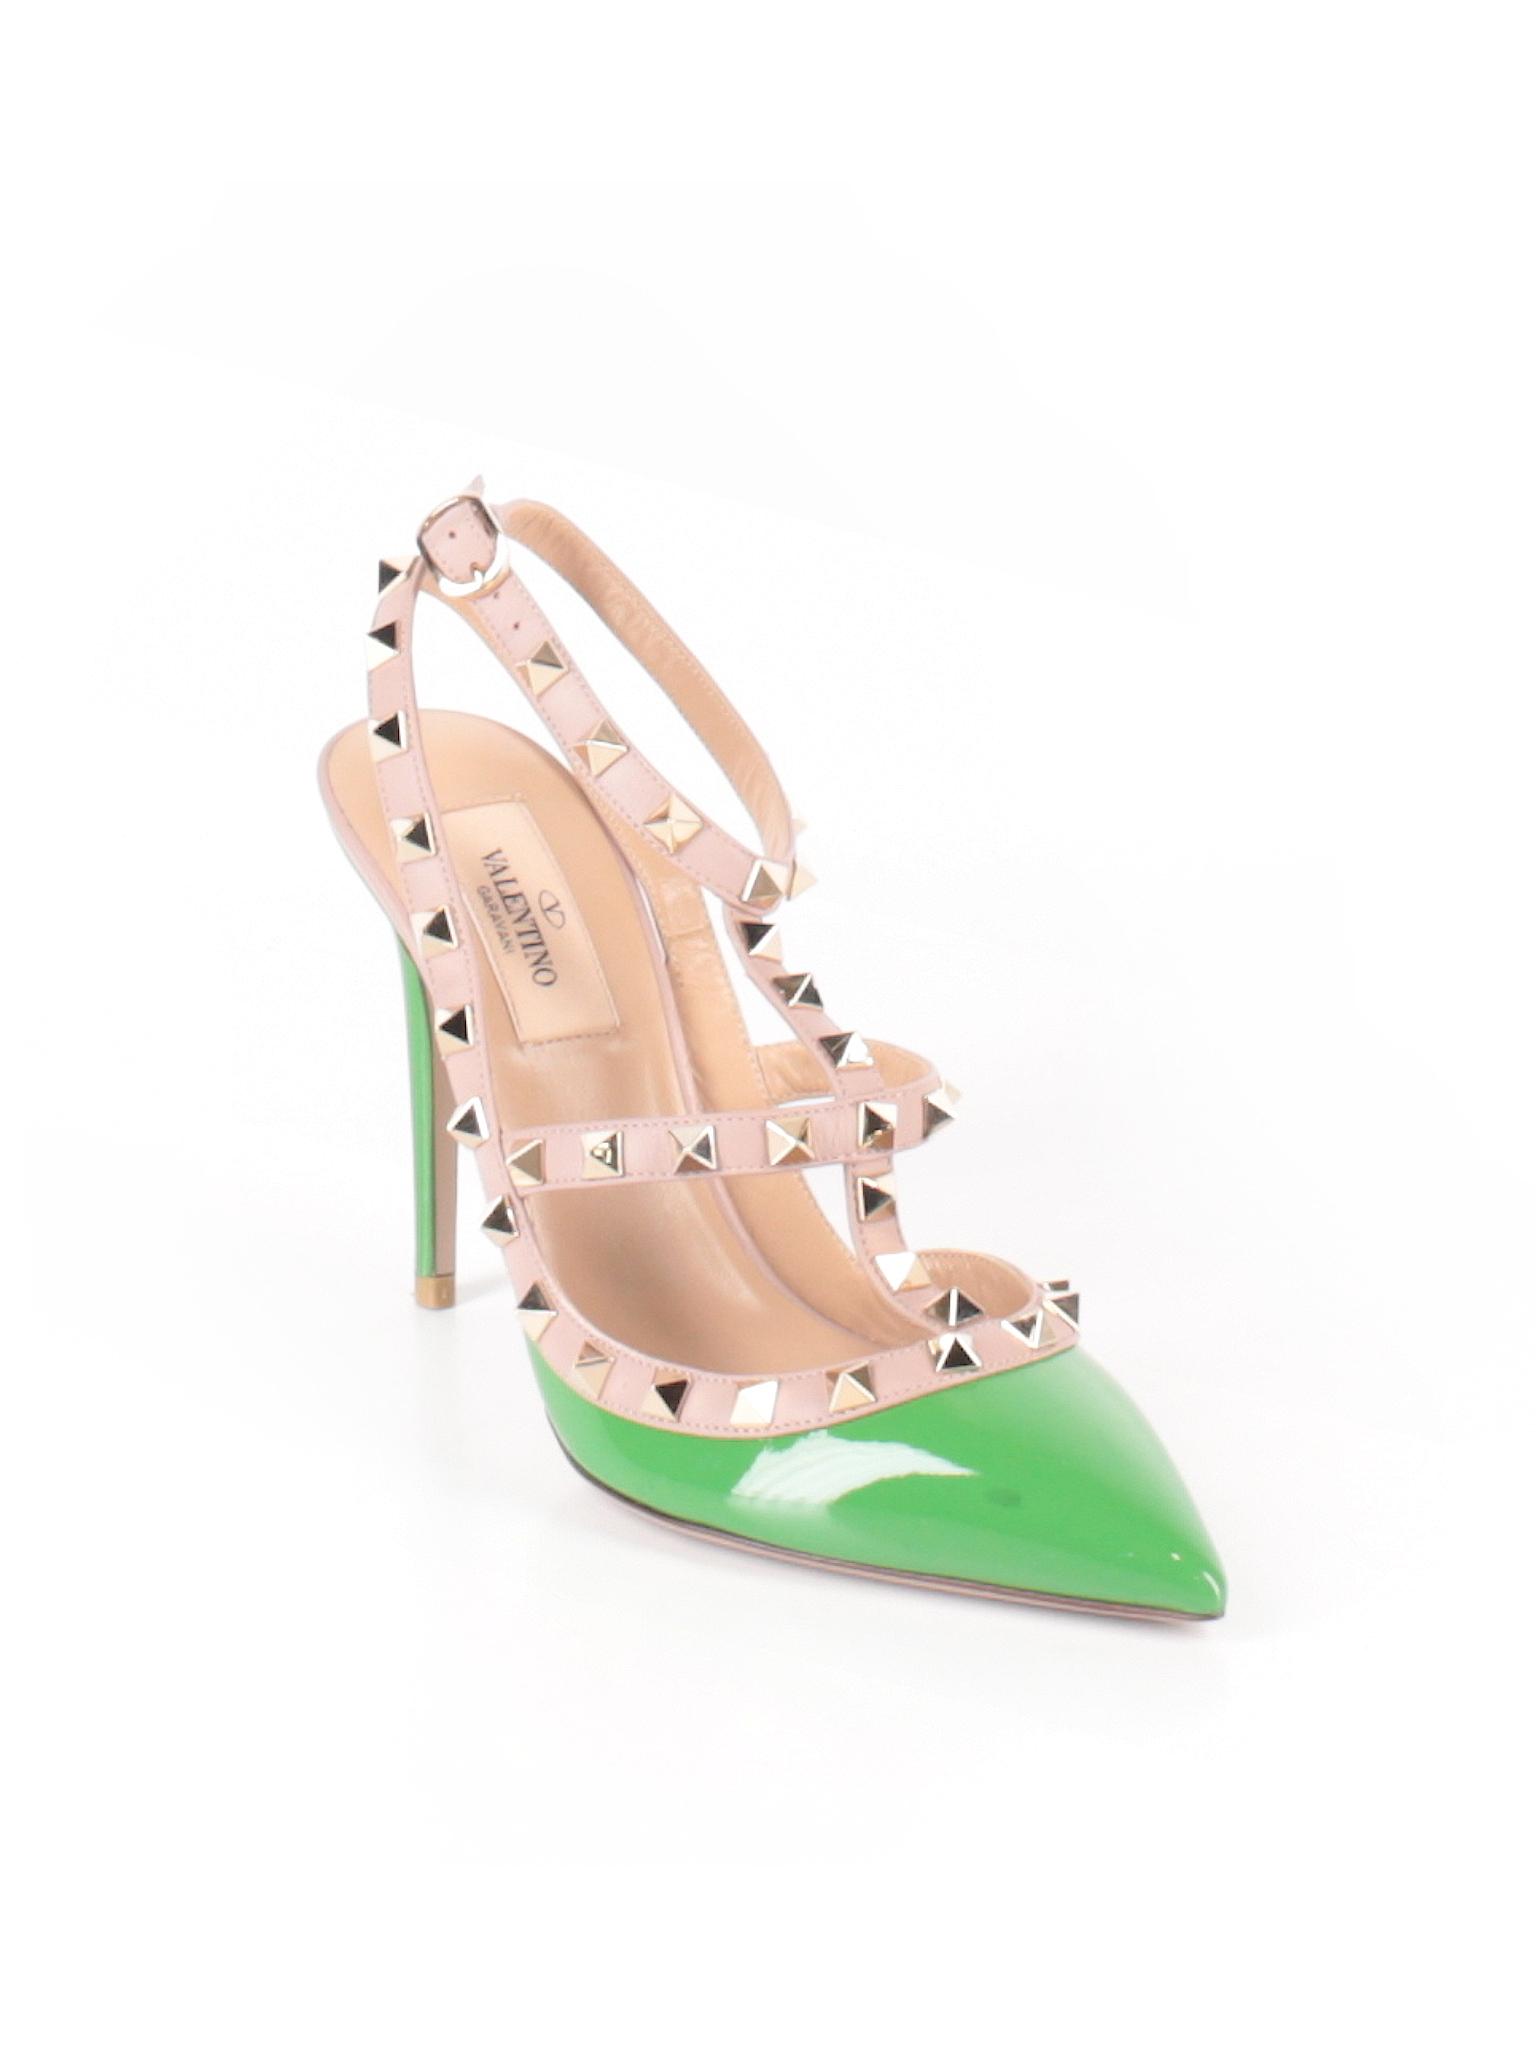 Boutique Boutique Valentino promotion Heels promotion 8xwzq8